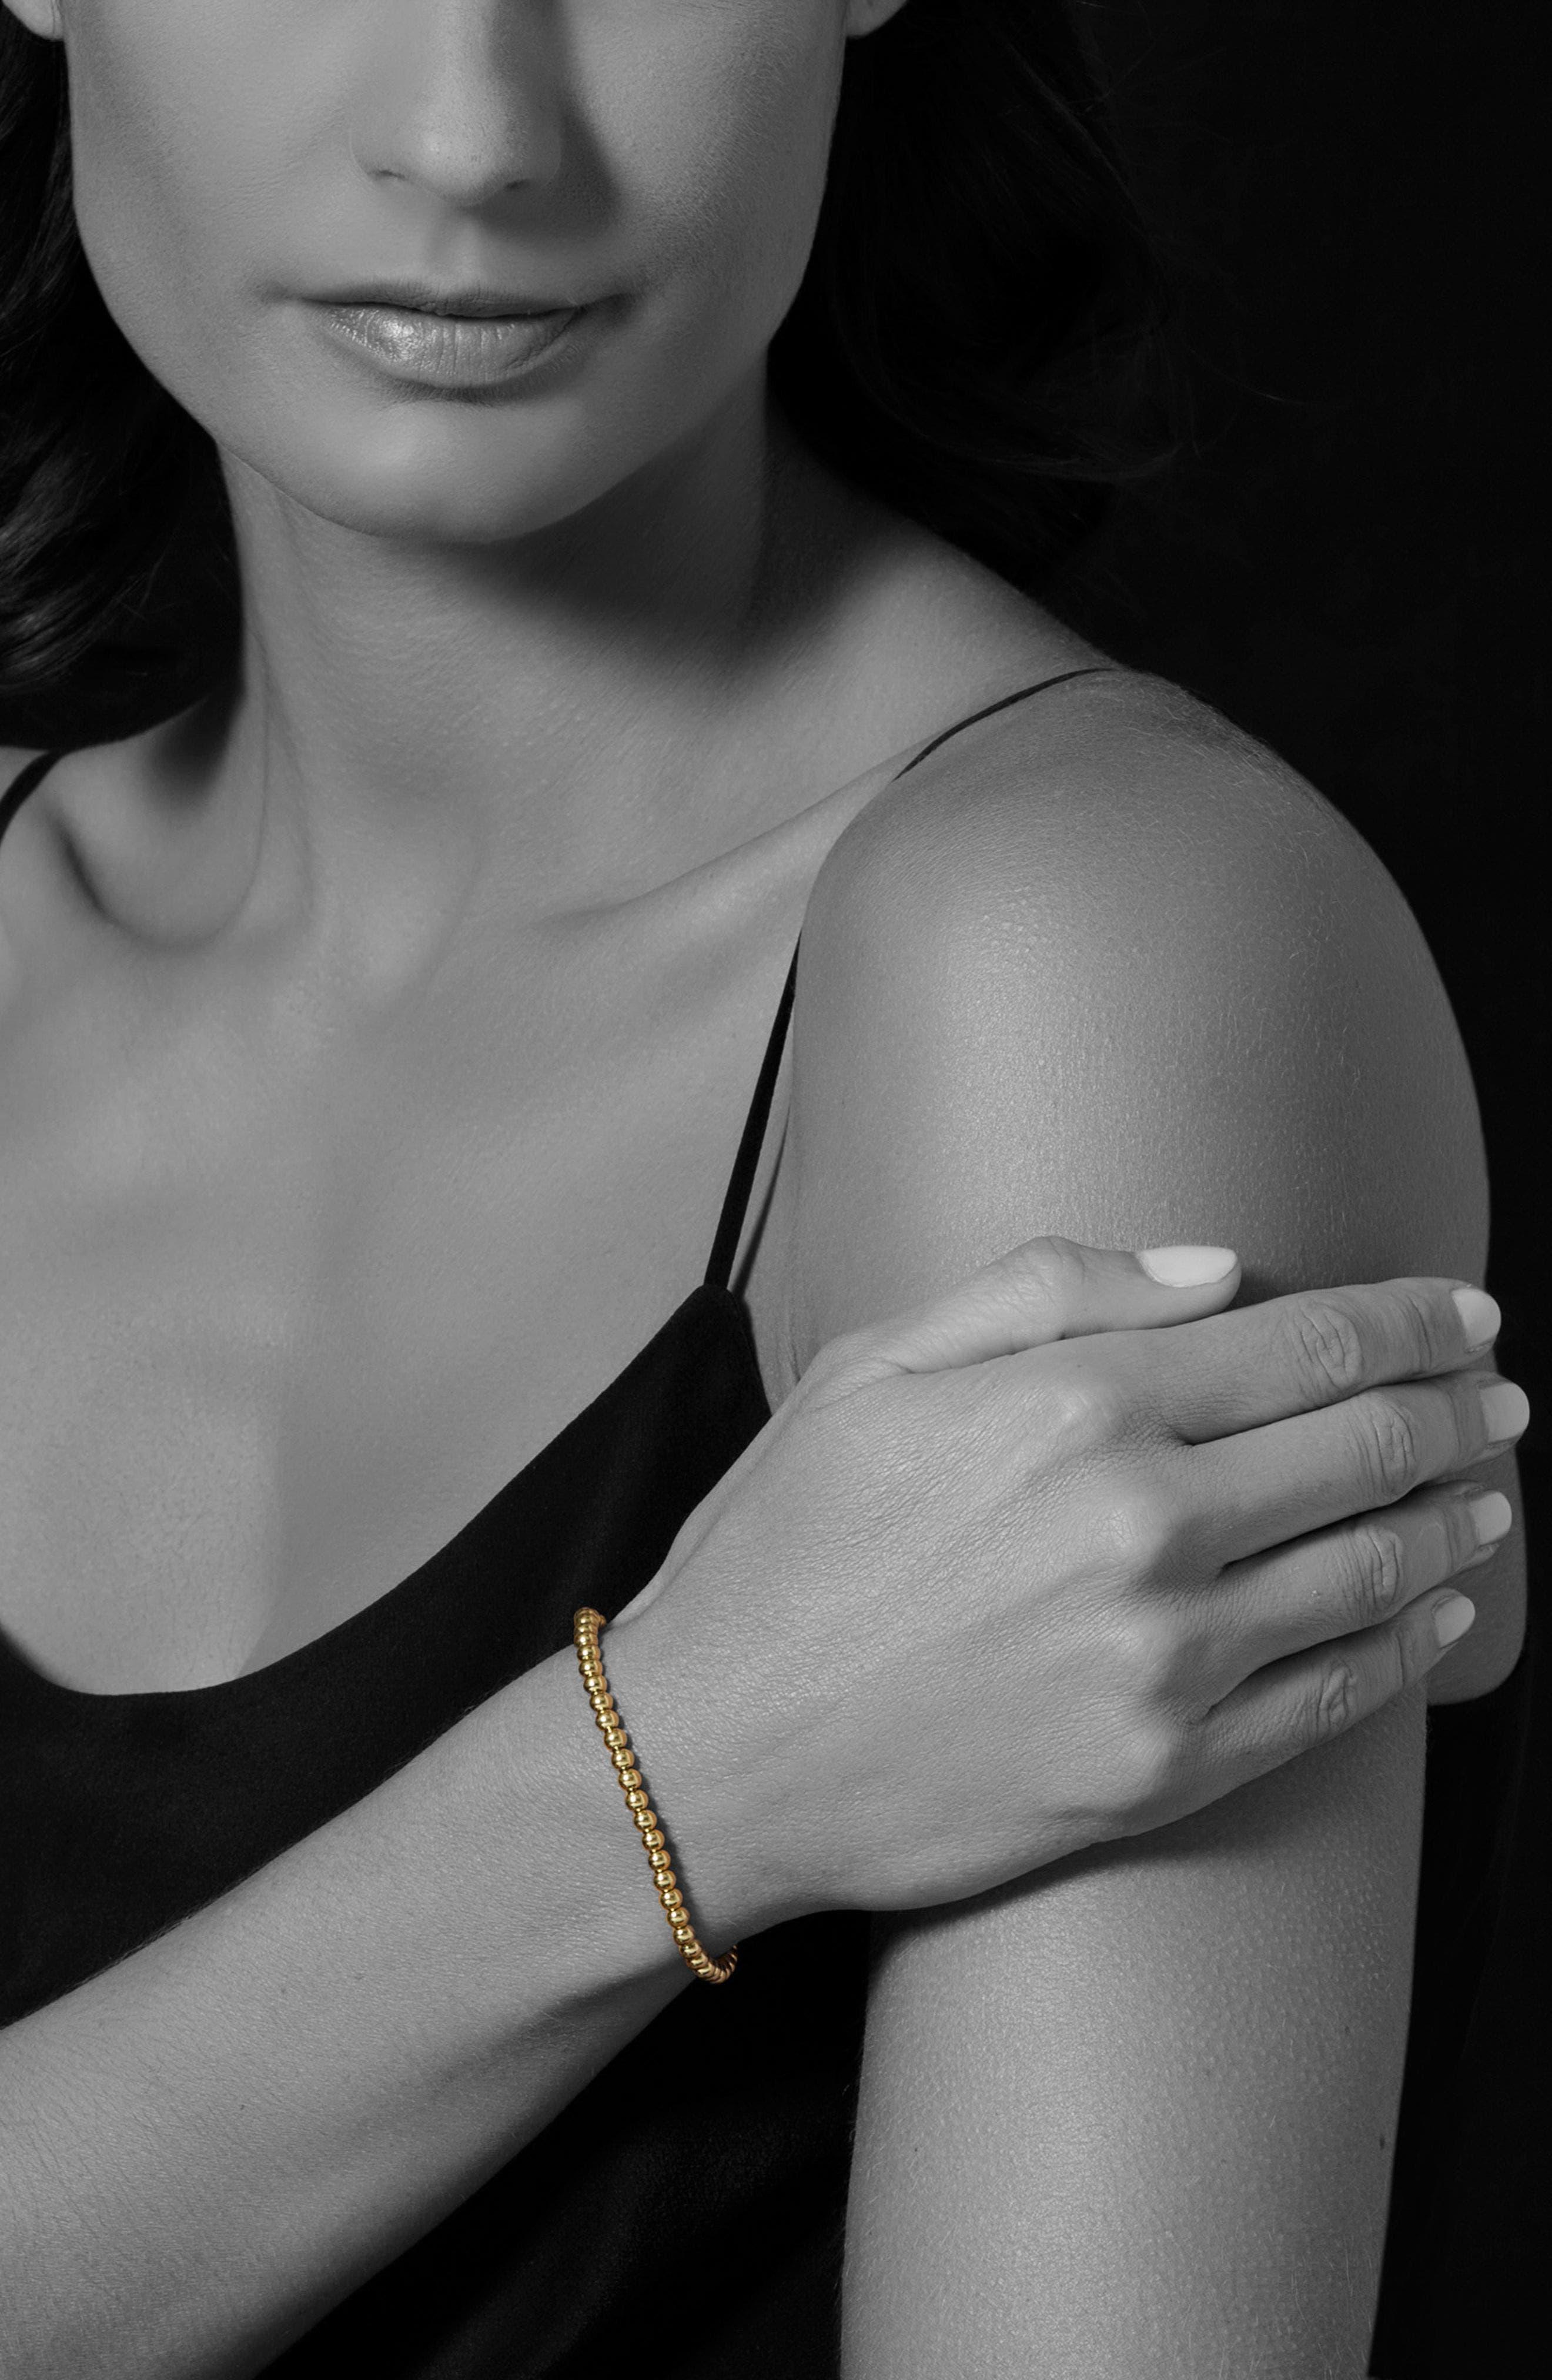 Caviar Gold Ball Stretch Bracelet,                             Alternate thumbnail 2, color,                             GOLD